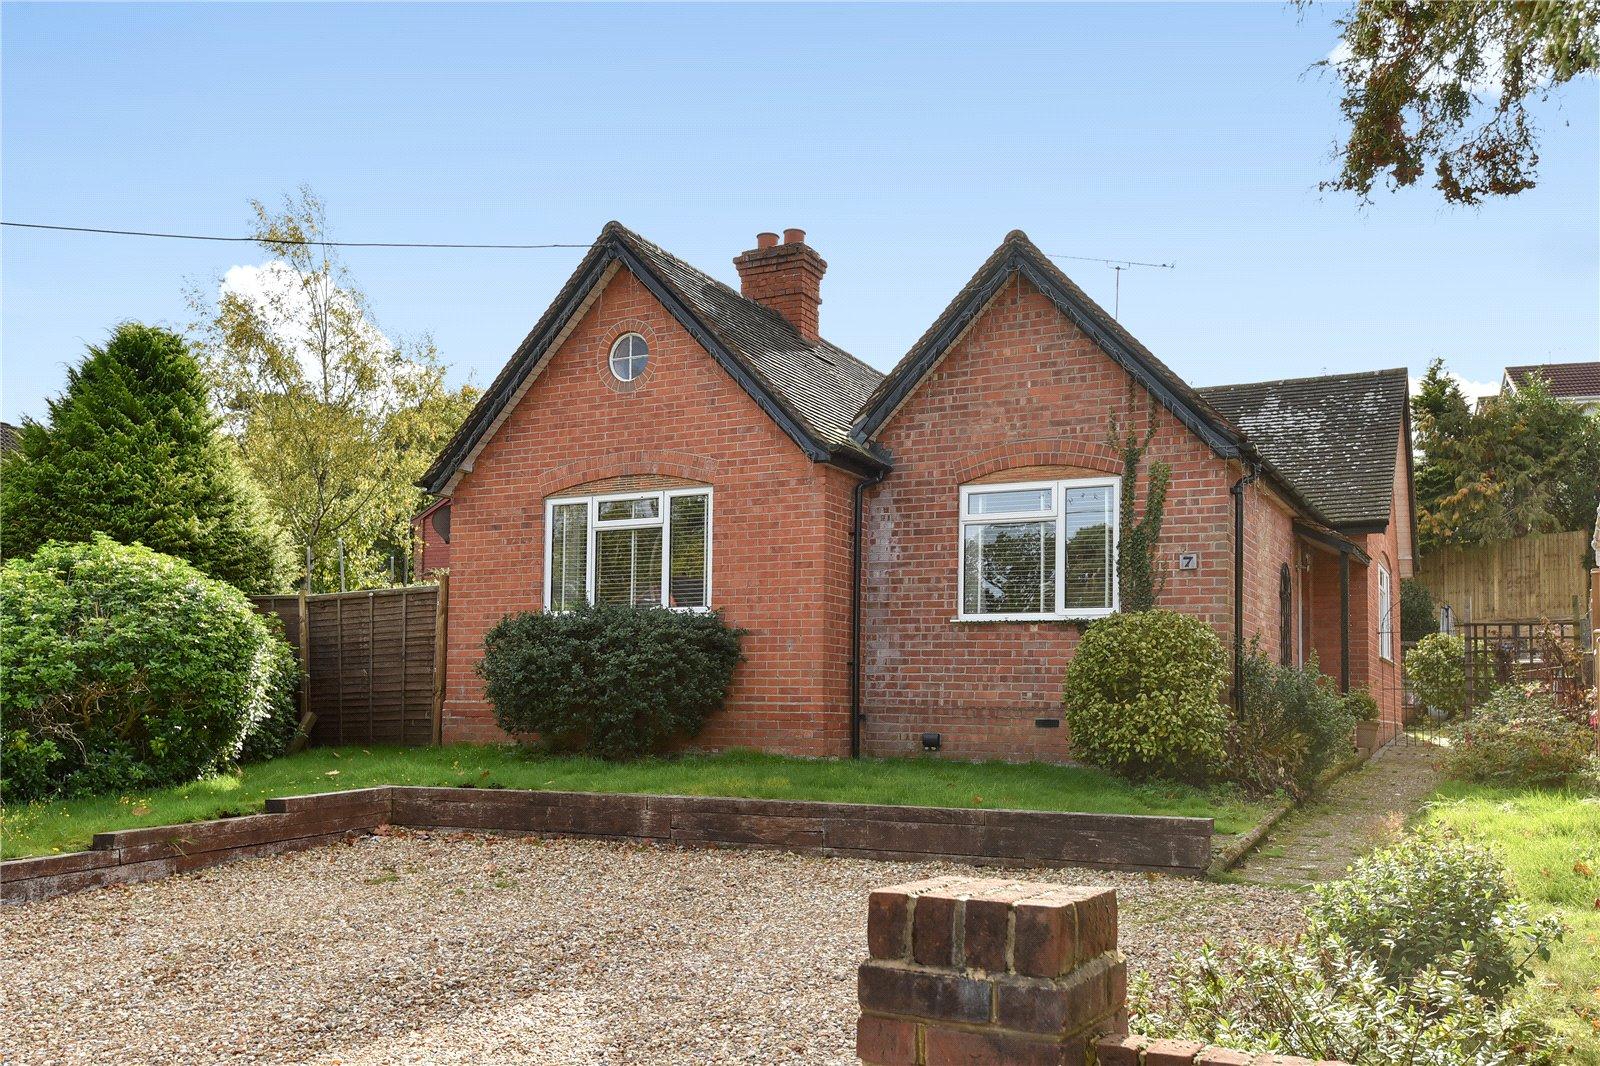 3 Bedrooms Detached Bungalow for sale in Longdown Road, Sandhurst, Berkshire, GU47